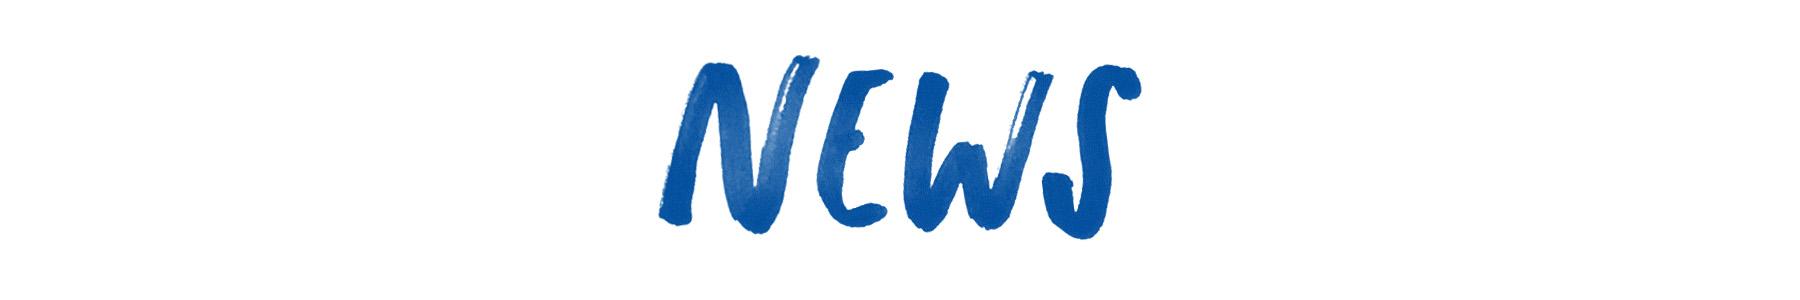 VLD-News-HeaderType.jpg